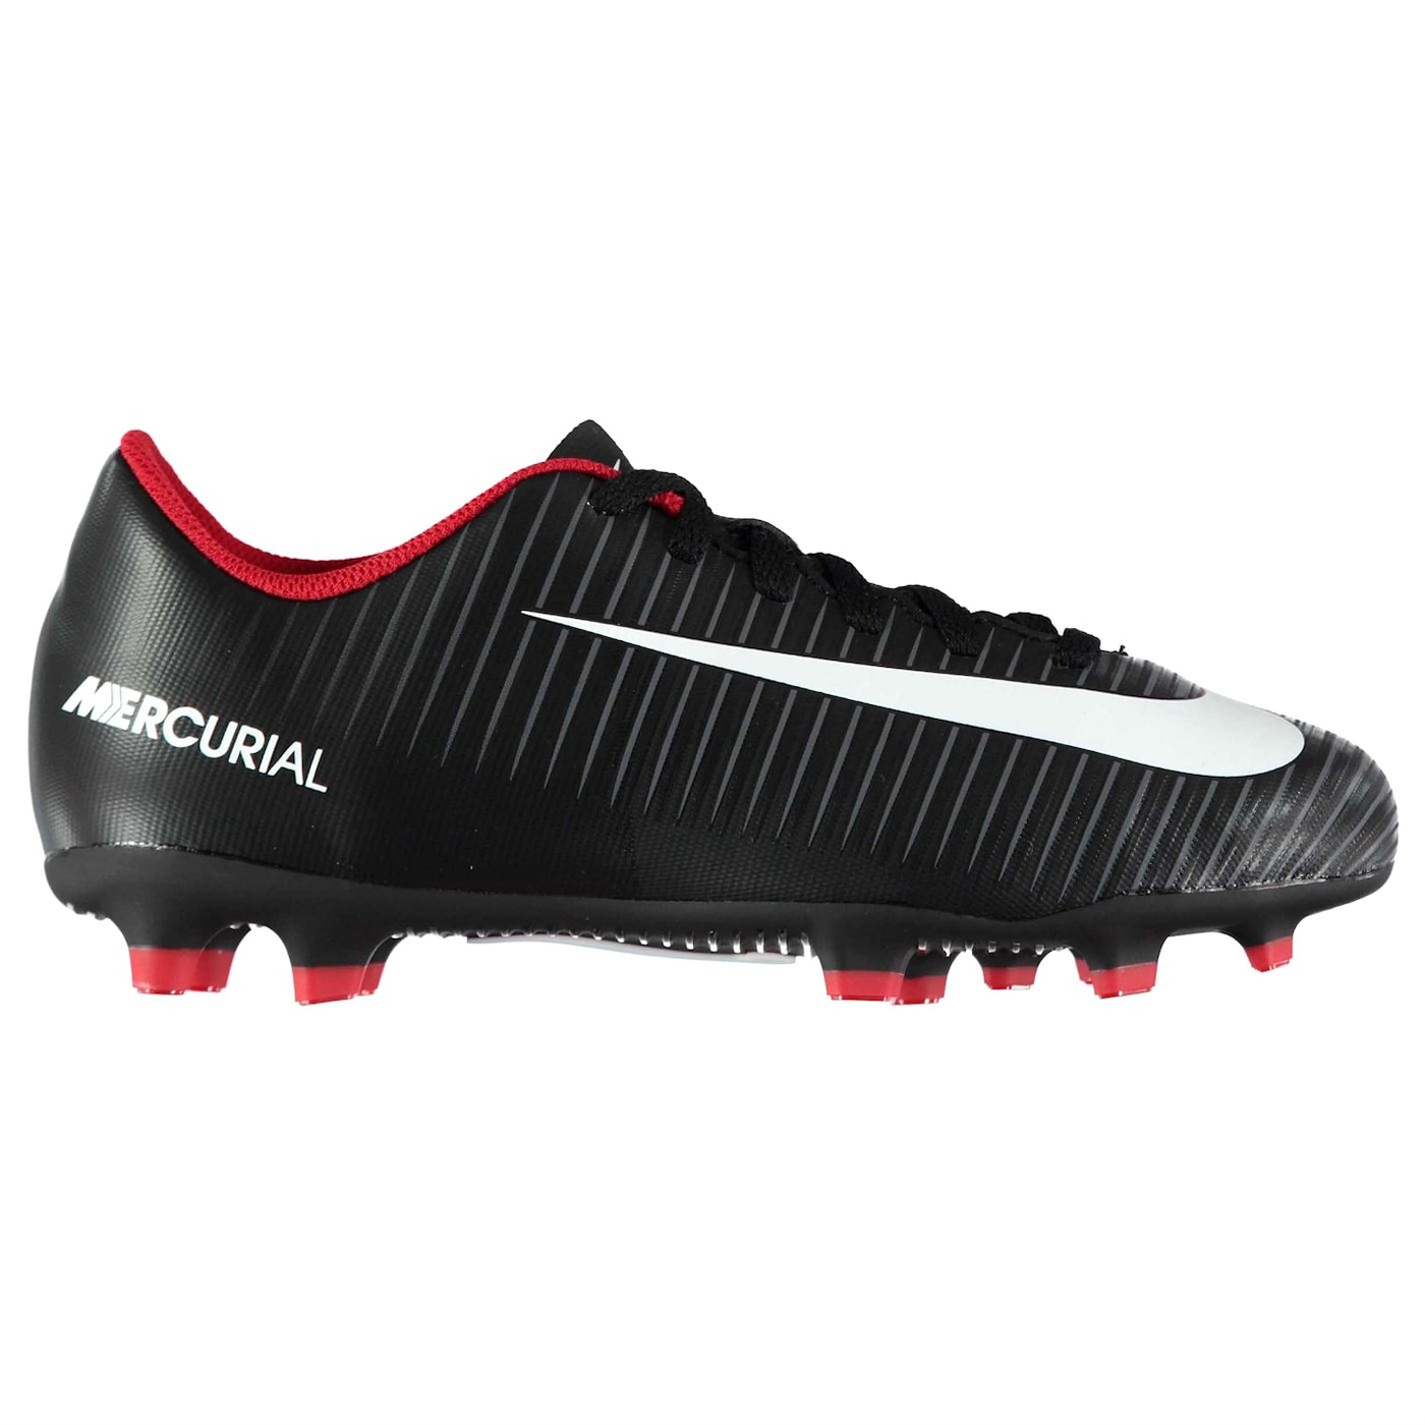 Nike Mercurial Vortex FG Football Boots Junior Boys